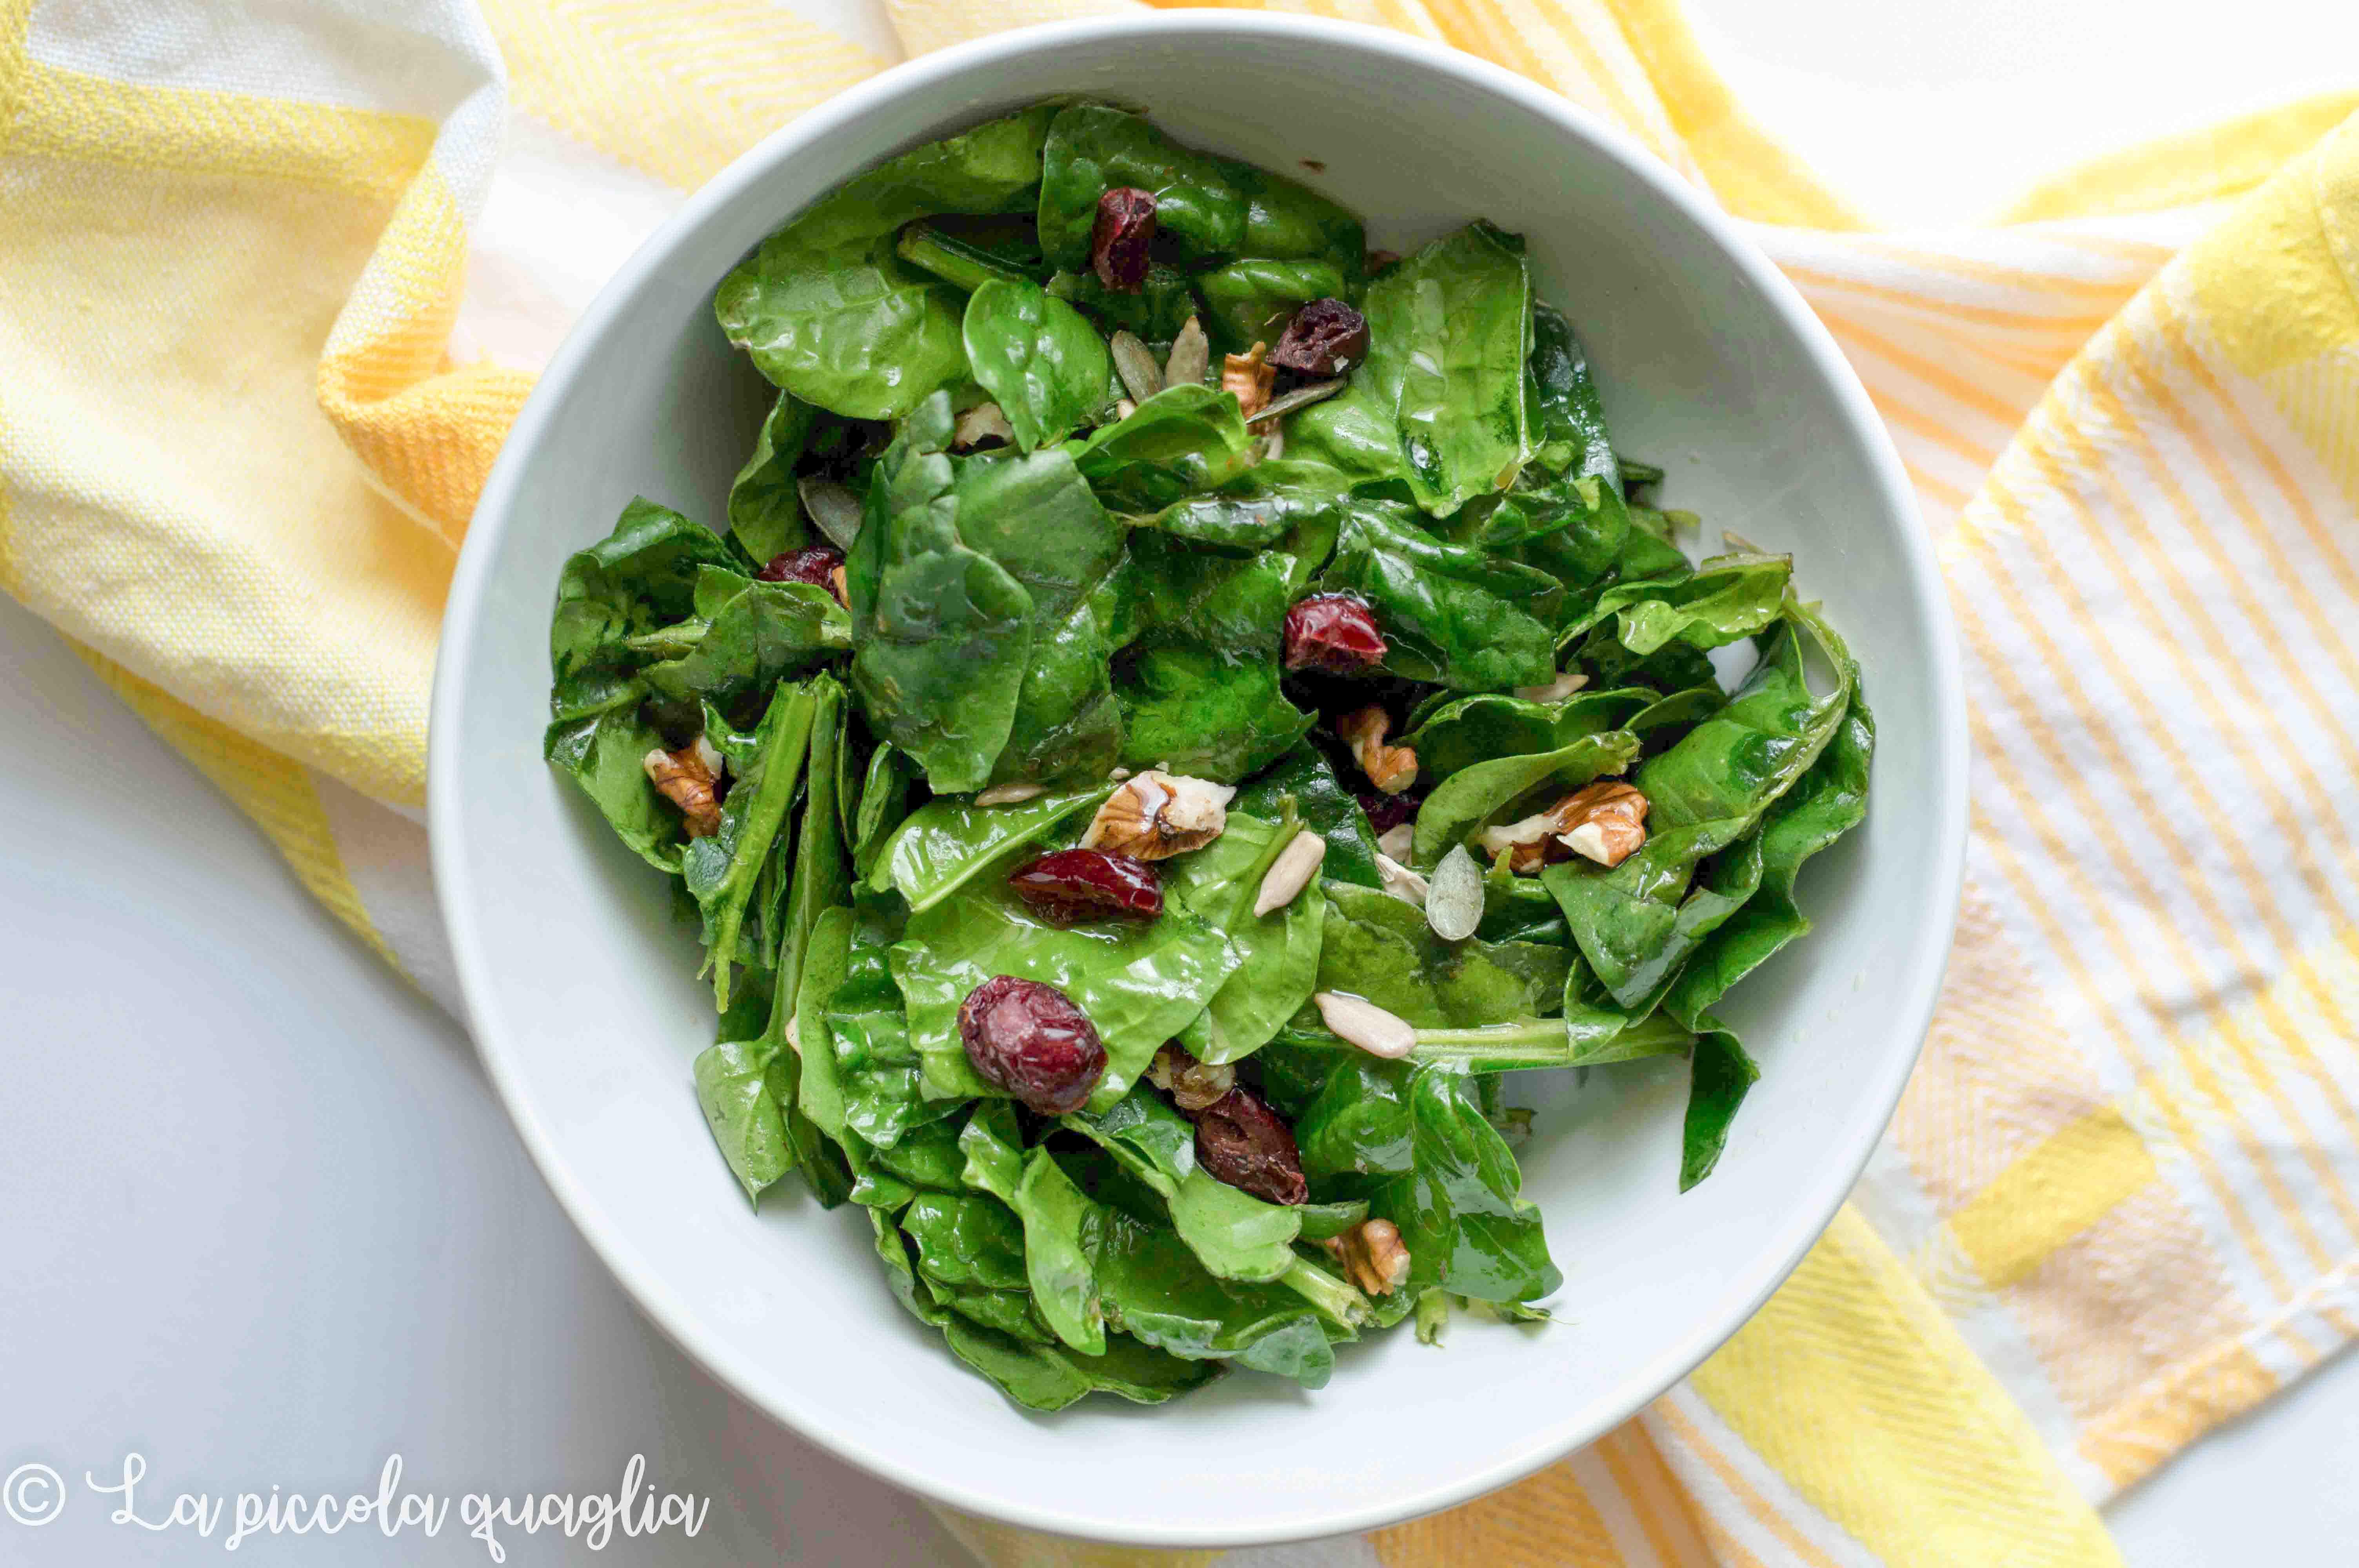 I sani venerdì: insalata invernale di spinaci